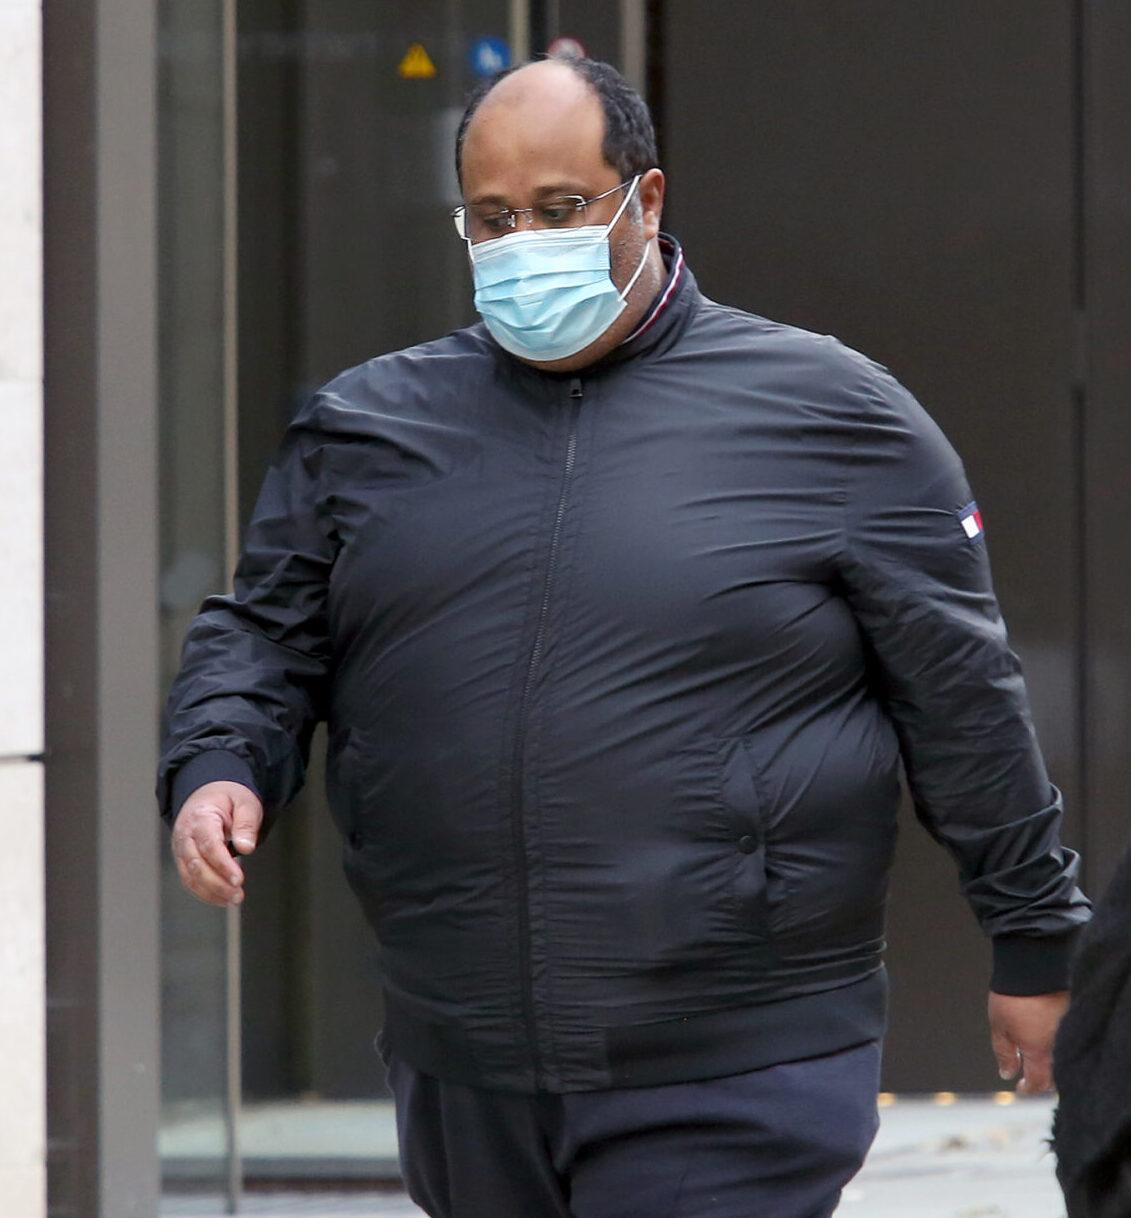 Qatari millionaire gets suspended sentence for killing pedestrian